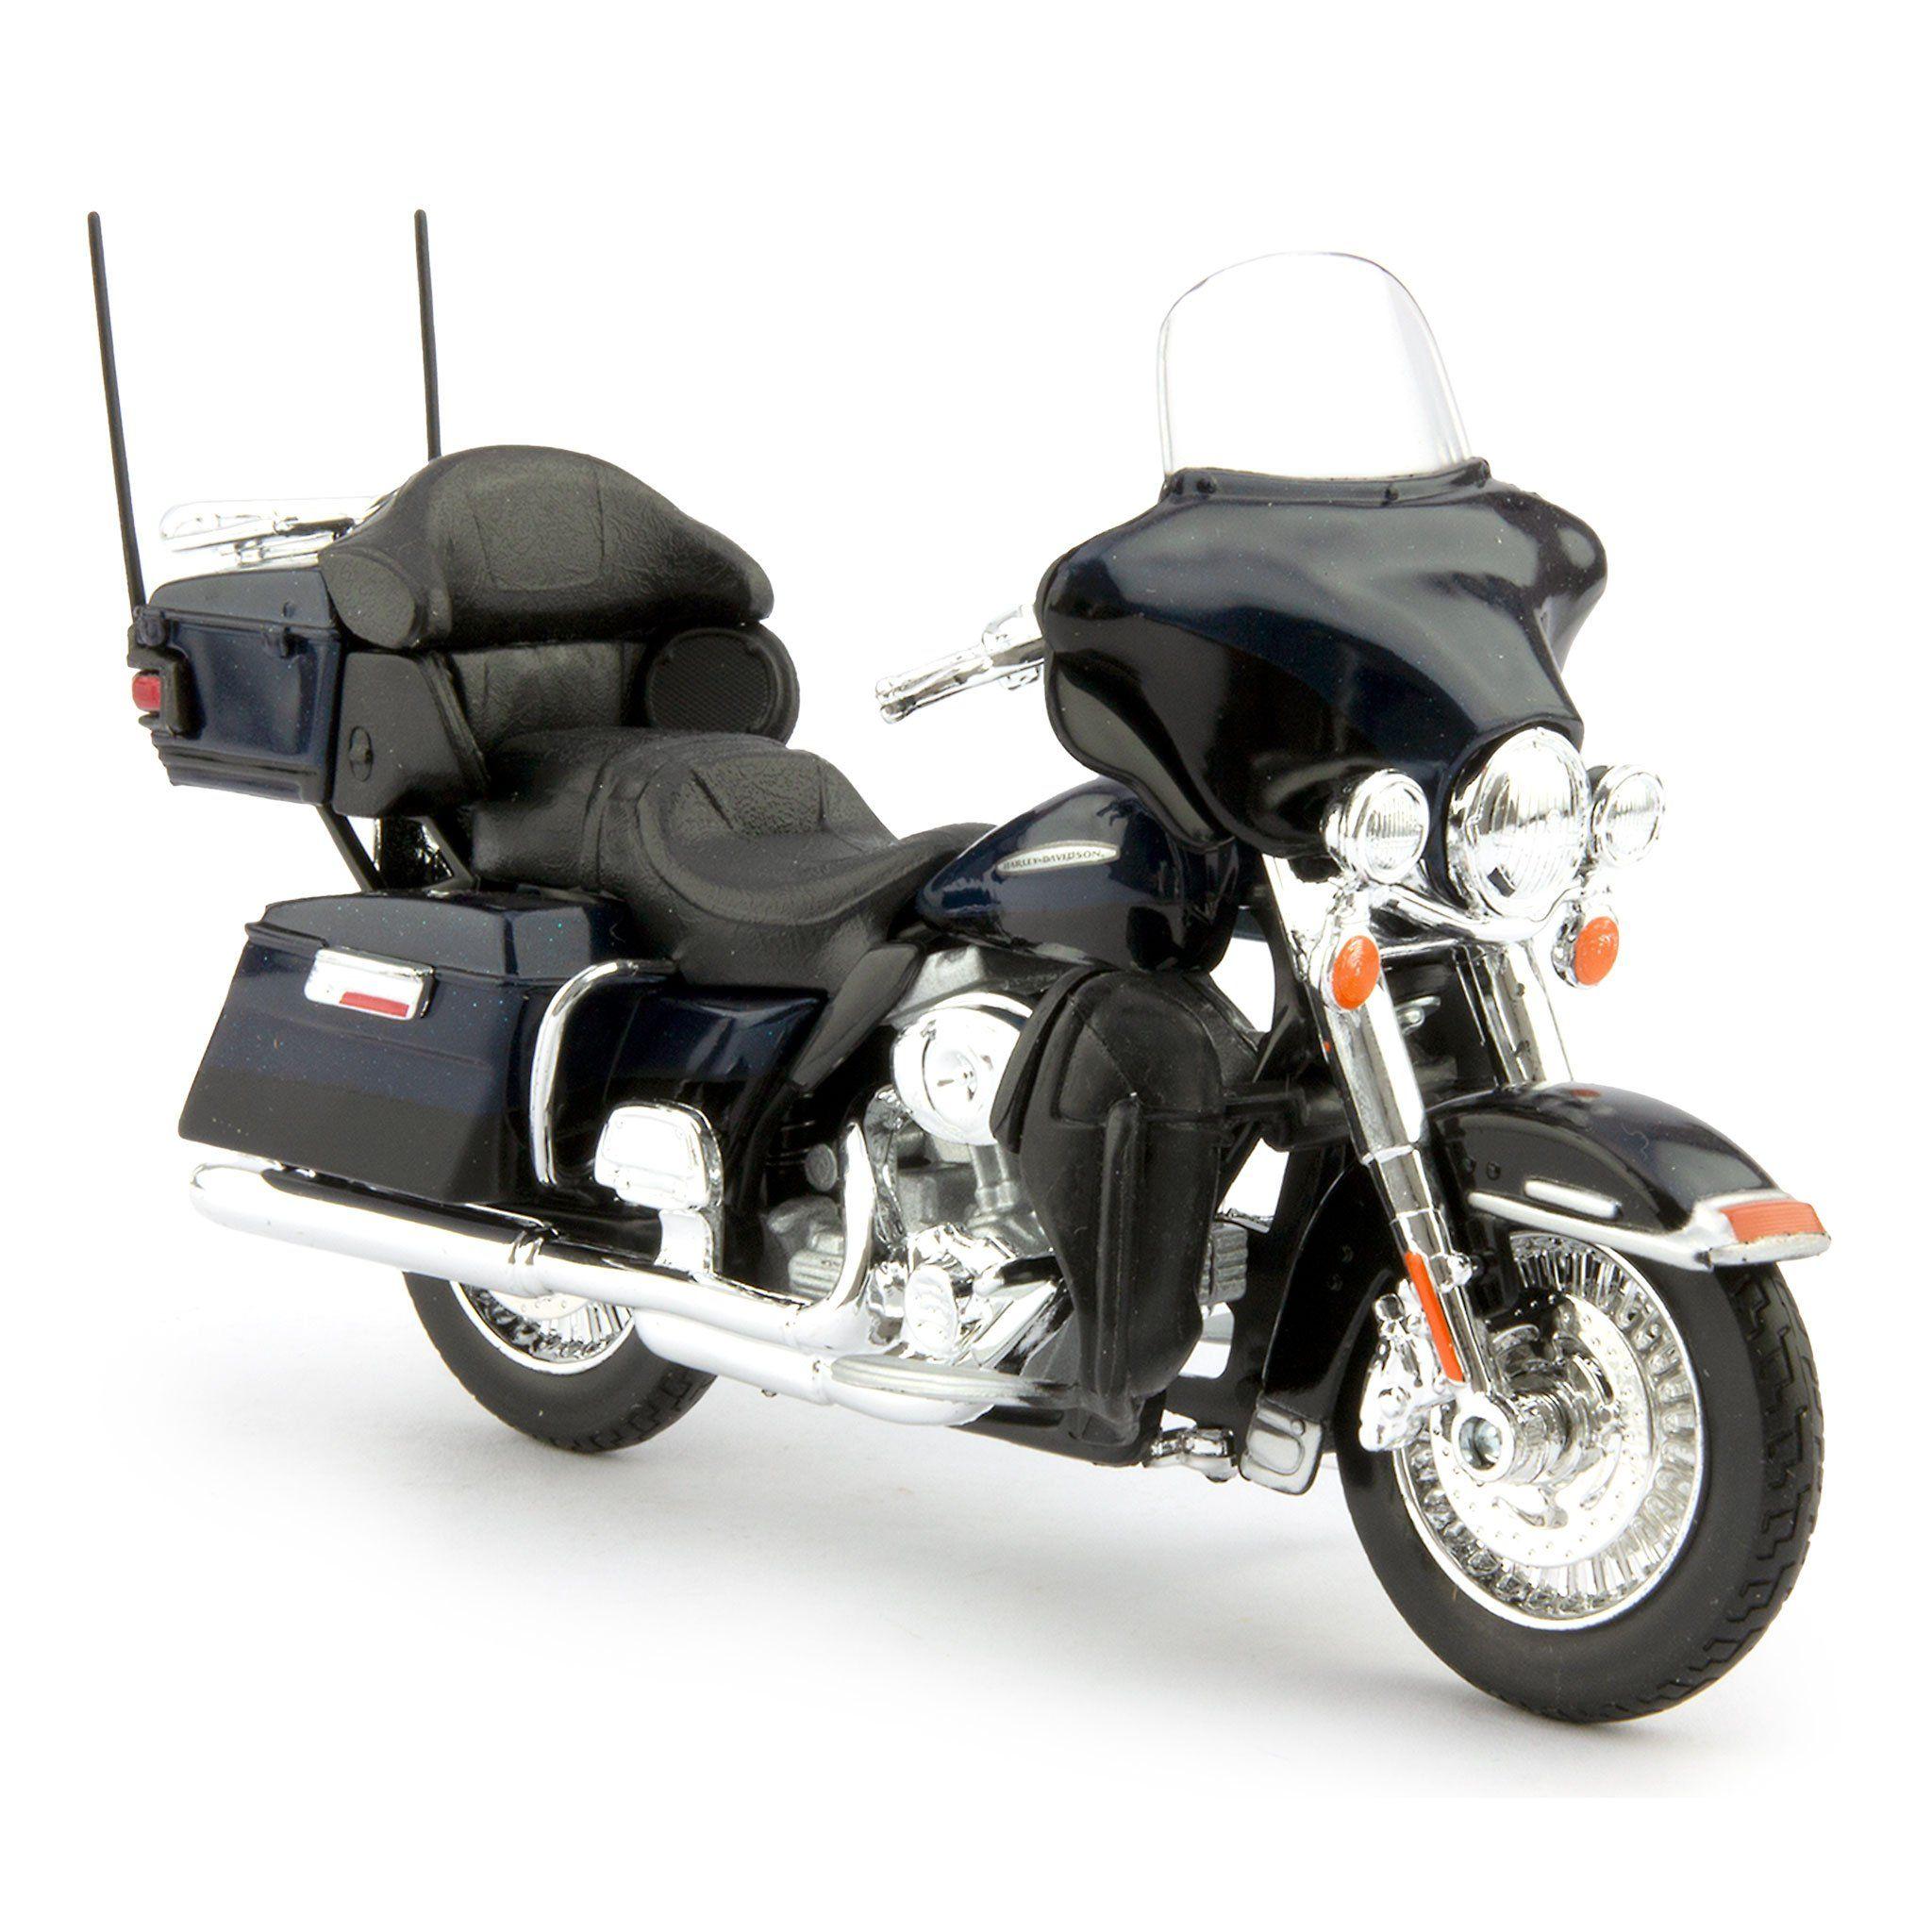 Harley-Davidson FLHTK Electra Glide Ultra Limited Diecast Model Motorcycle 2013 blue - 1:18 scale